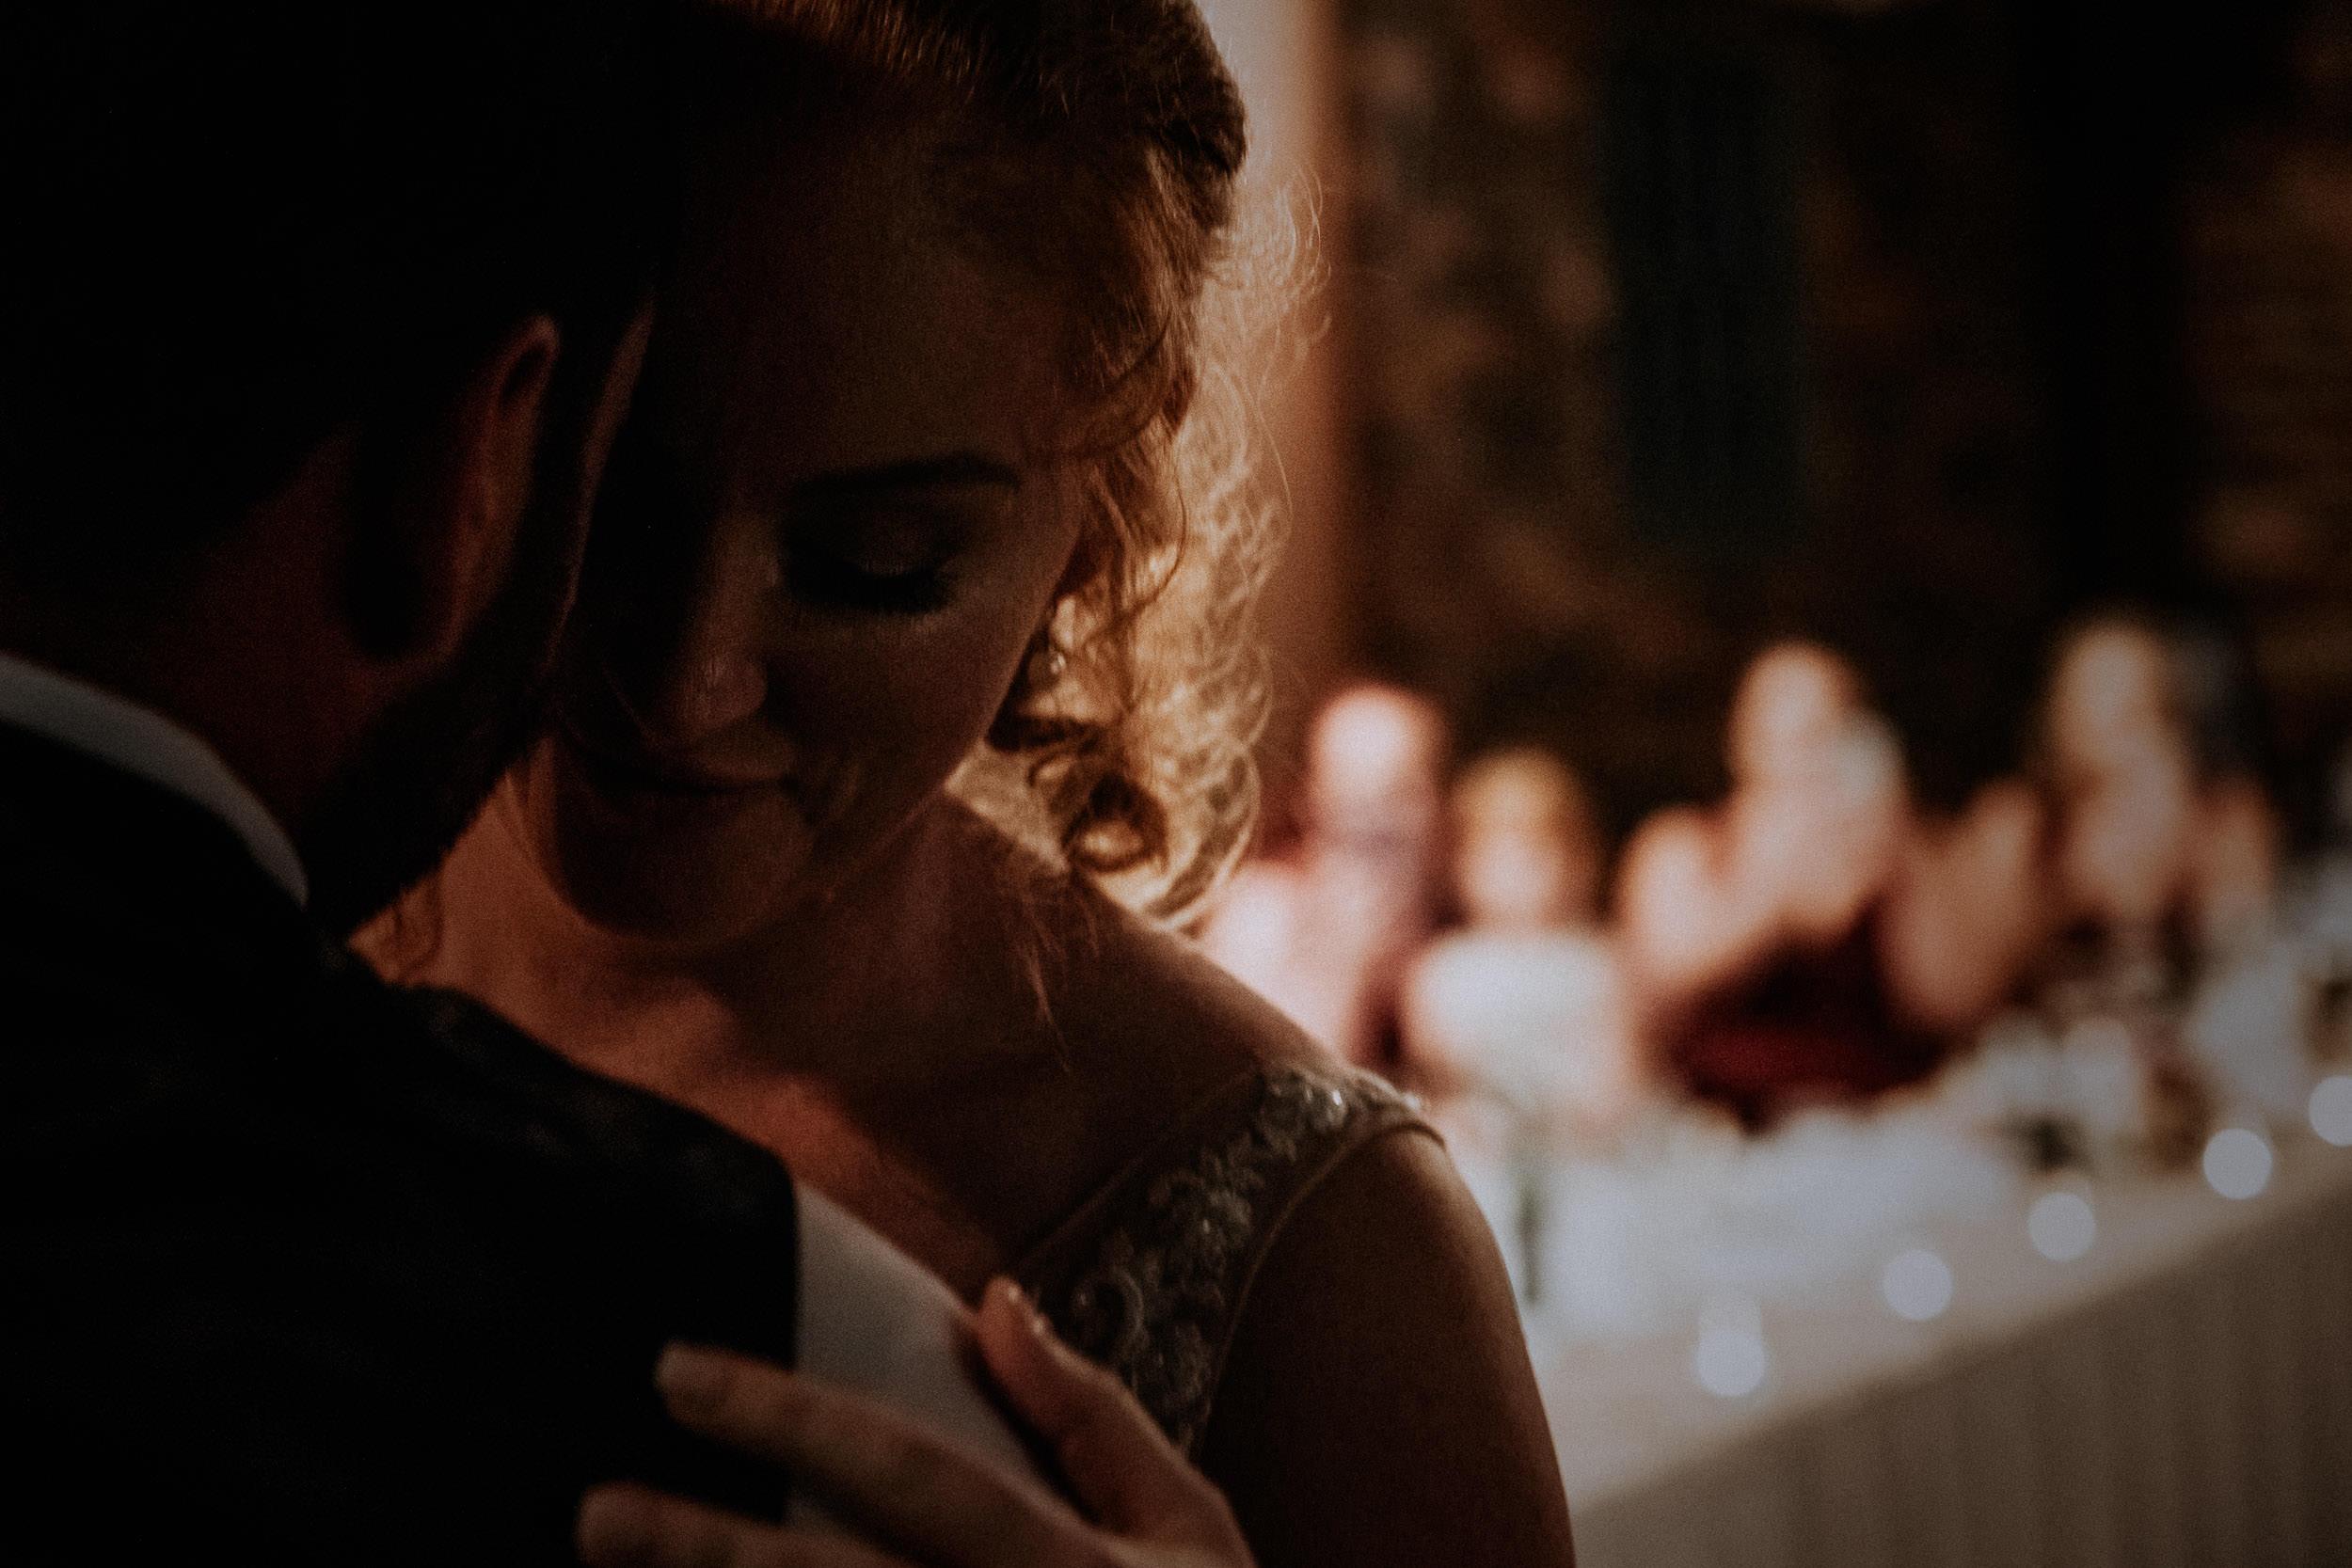 sav & mike_elopement wedding photography_kings & thieves_blog (23 of 44).jpg